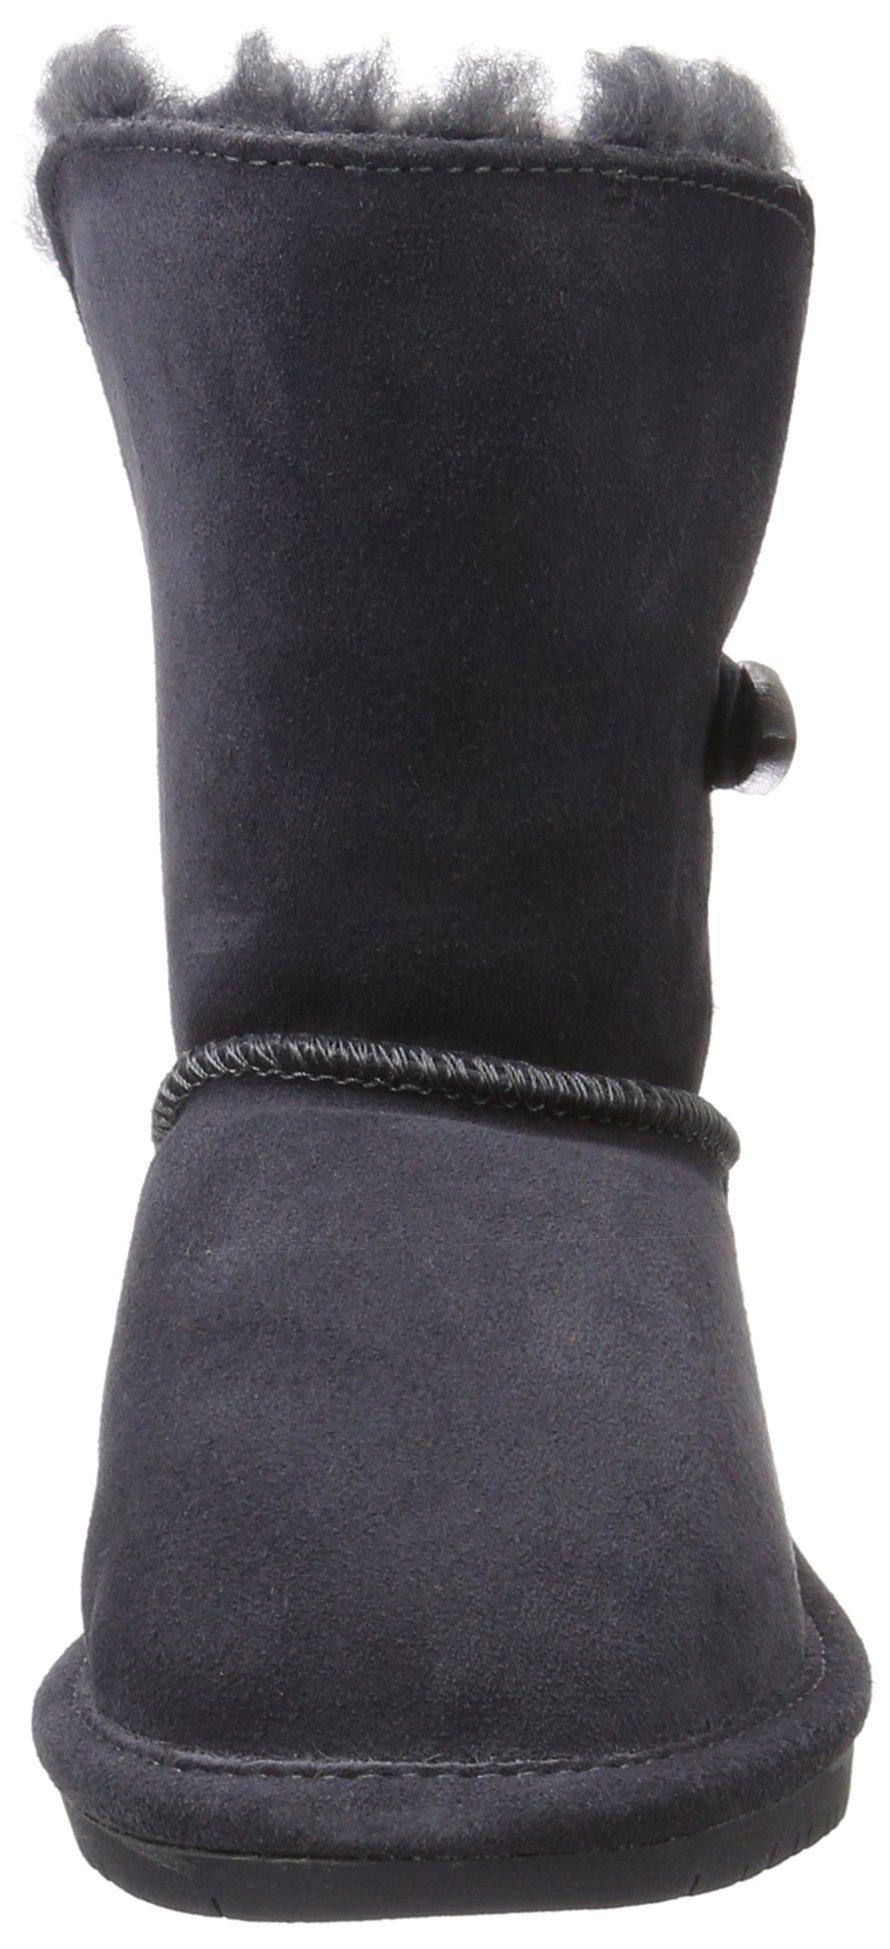 Bearpaw Abigail Charcoal Unisex Kids Shearling Boot Size 1M by BEARPAW (Image #4)